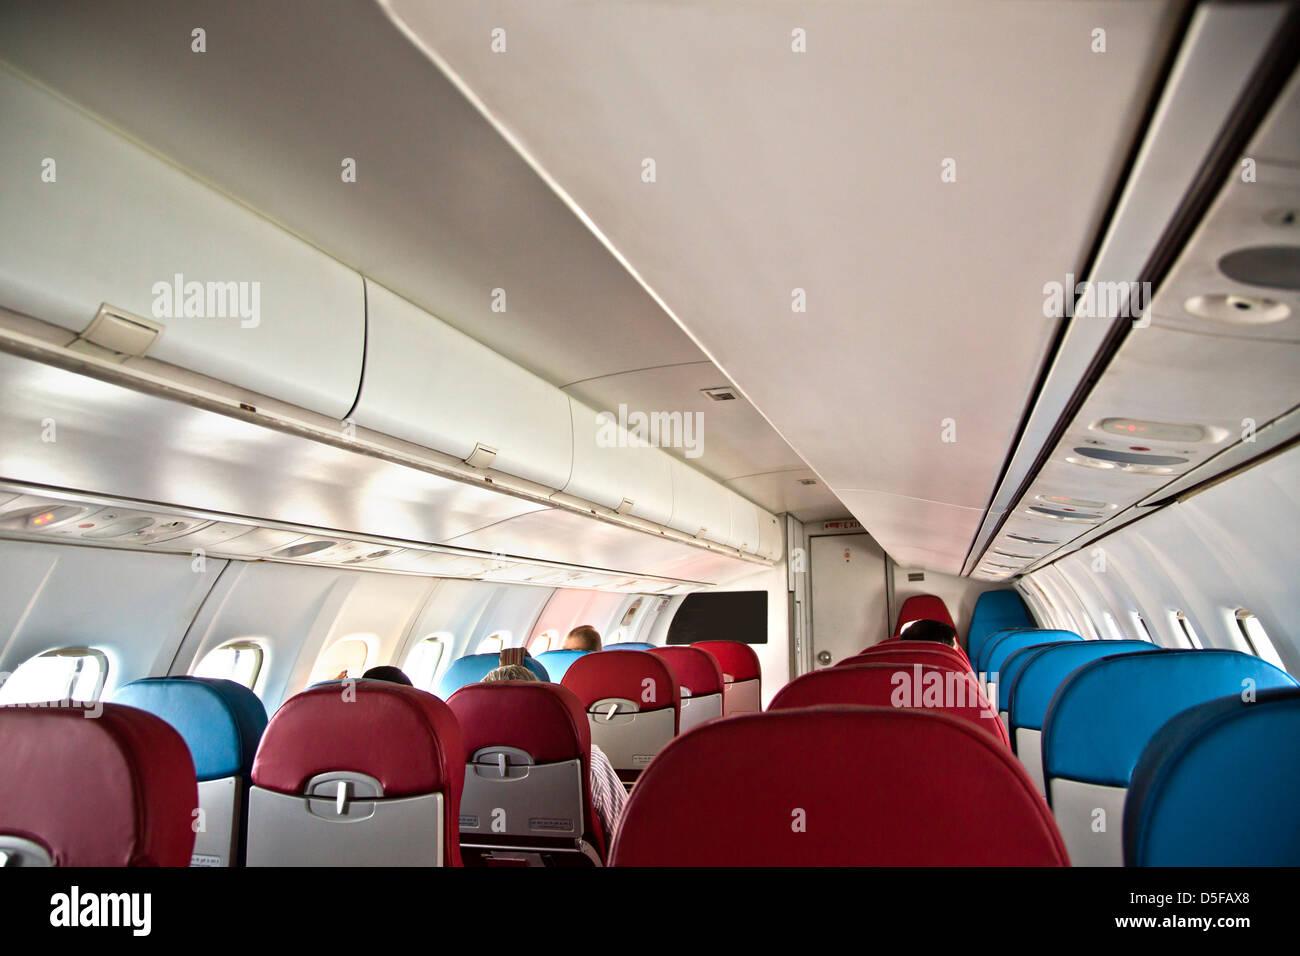 Interiors of an airplane, Shimla Airport, Shimla, Himachal Pradesh, India - Stock Image